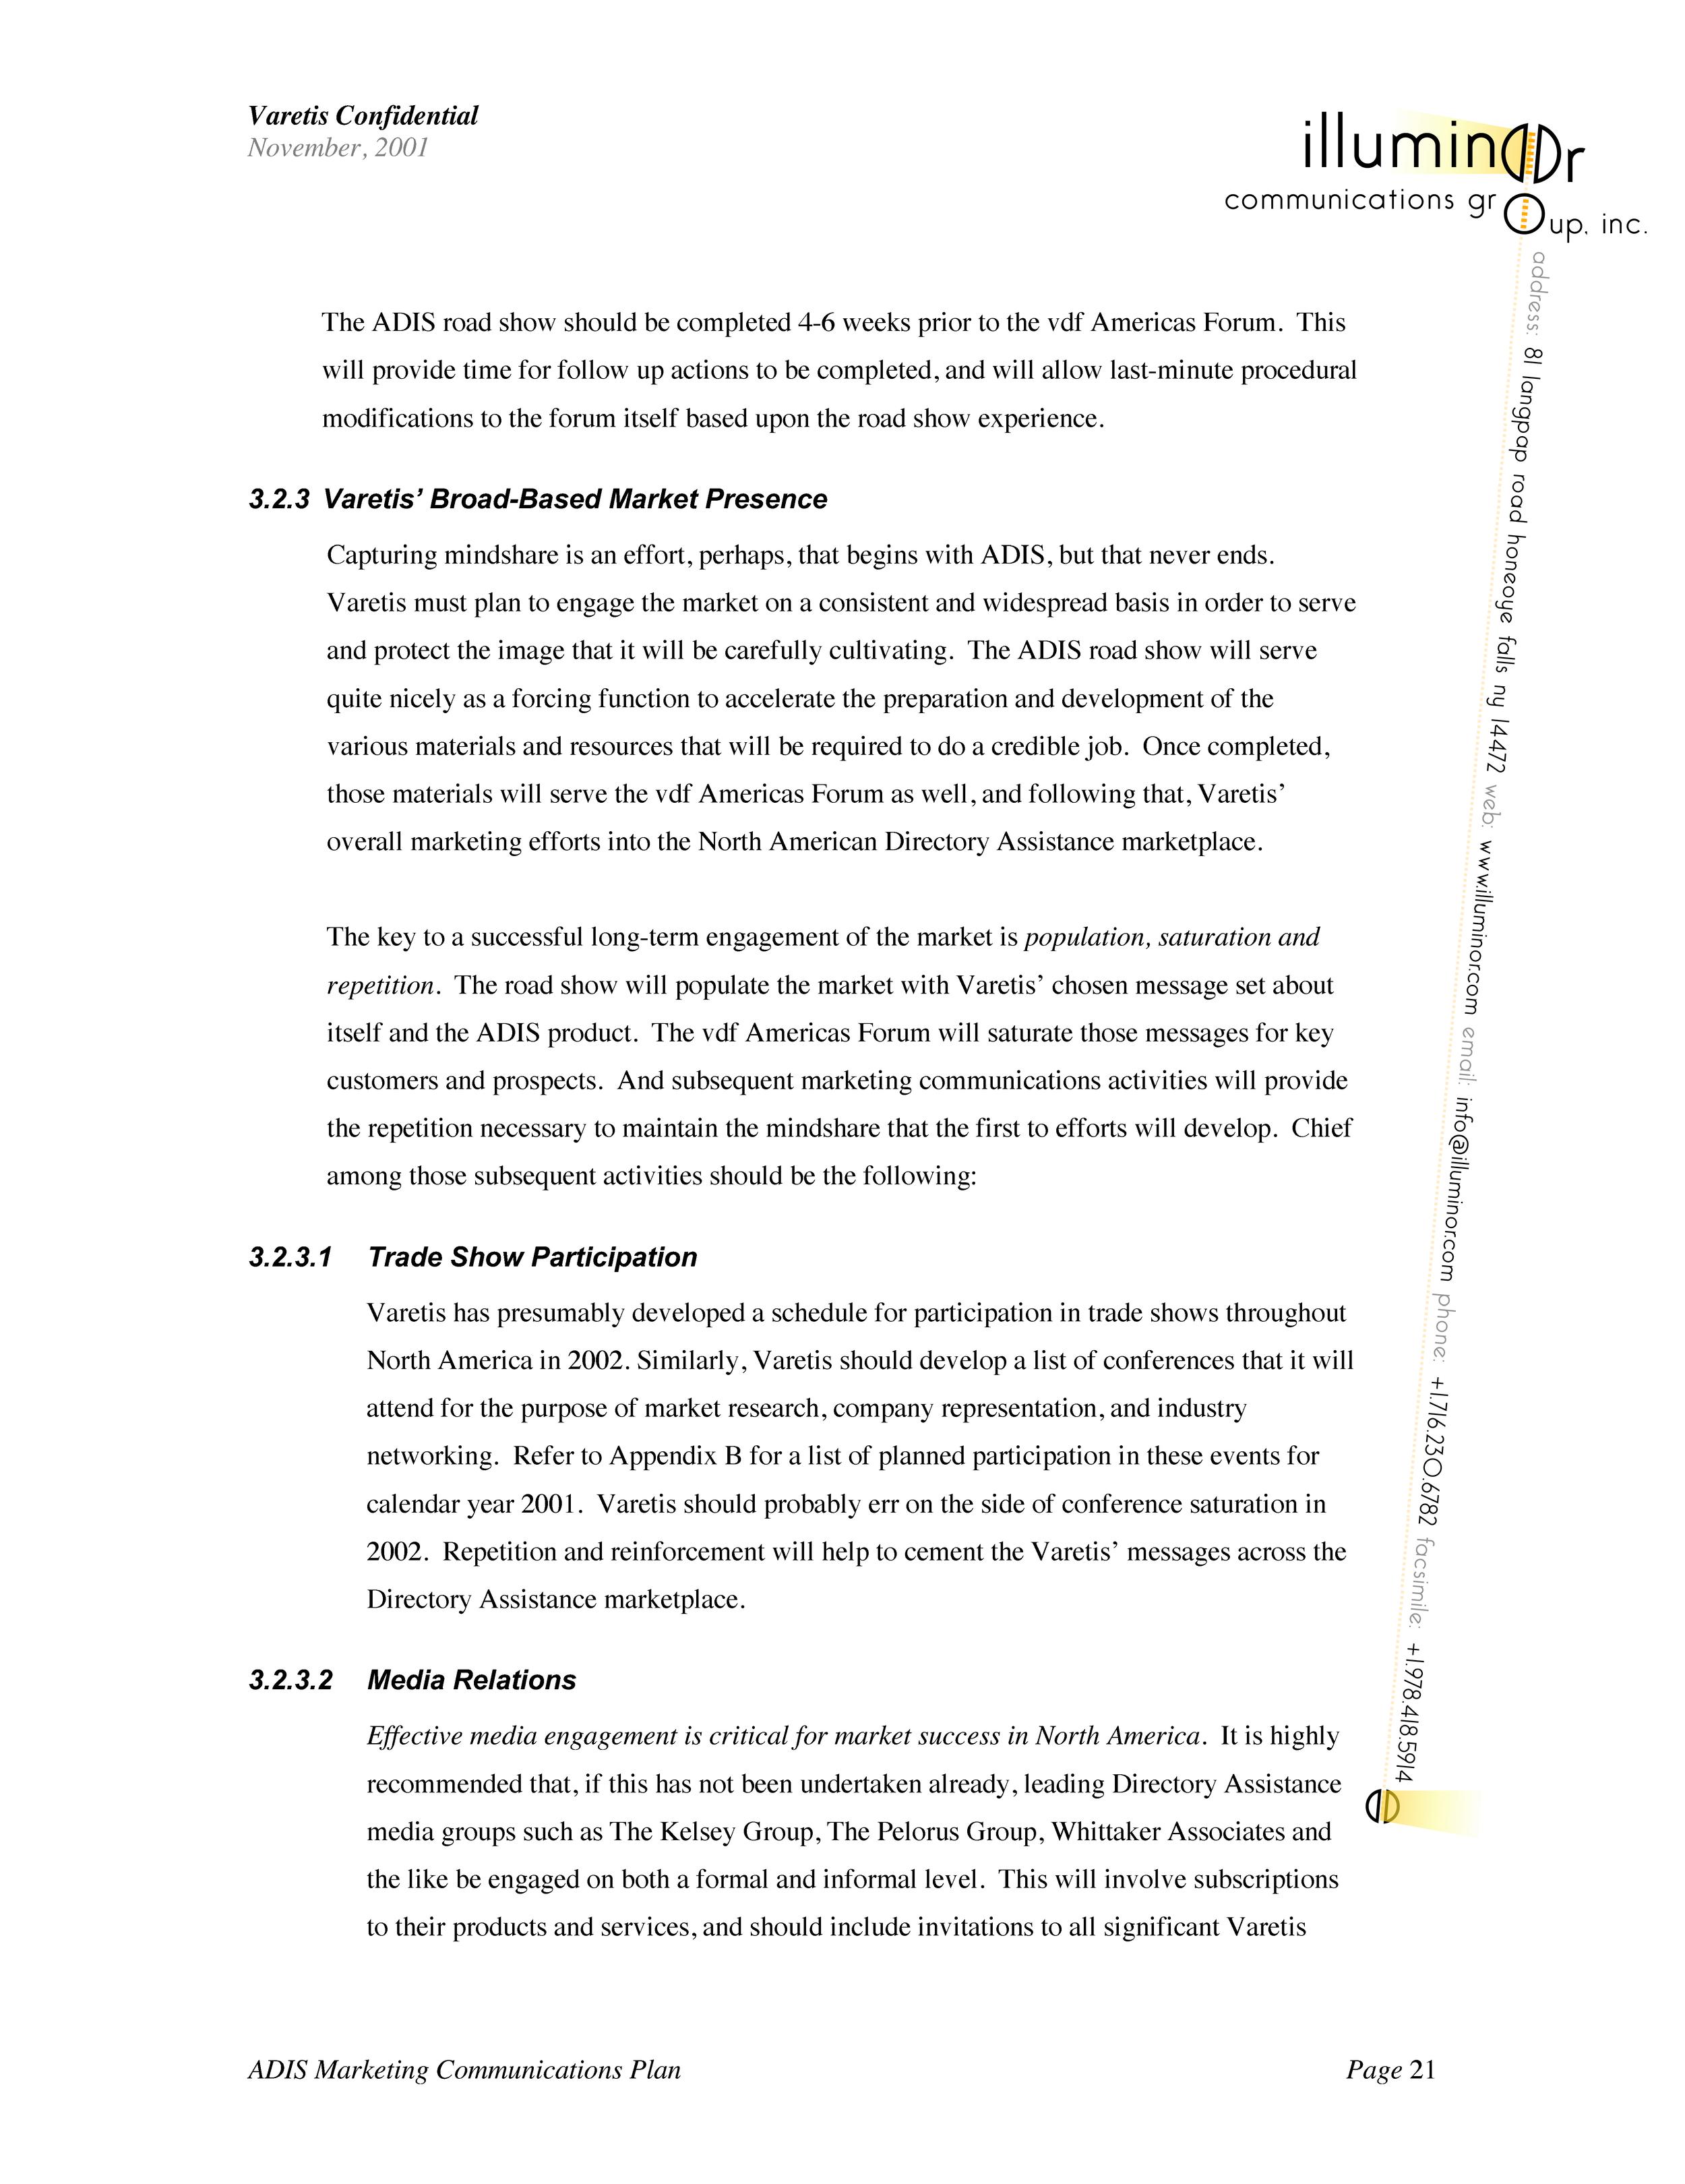 ADIS Marcomm Plan_Page_21.png